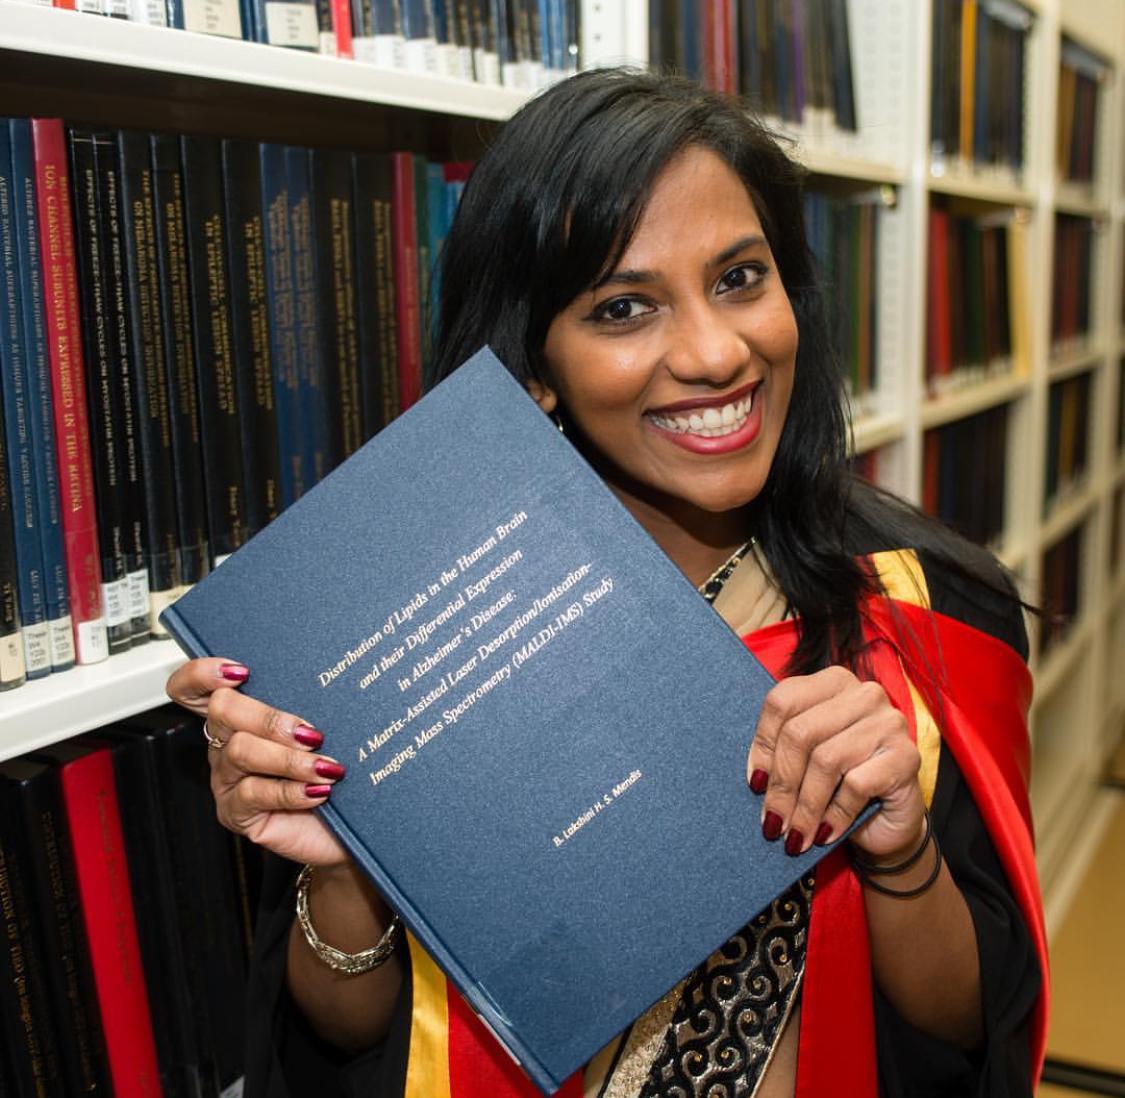 Lakshini Mendis  @scisites Specialty: Neuroscience/Science Writing